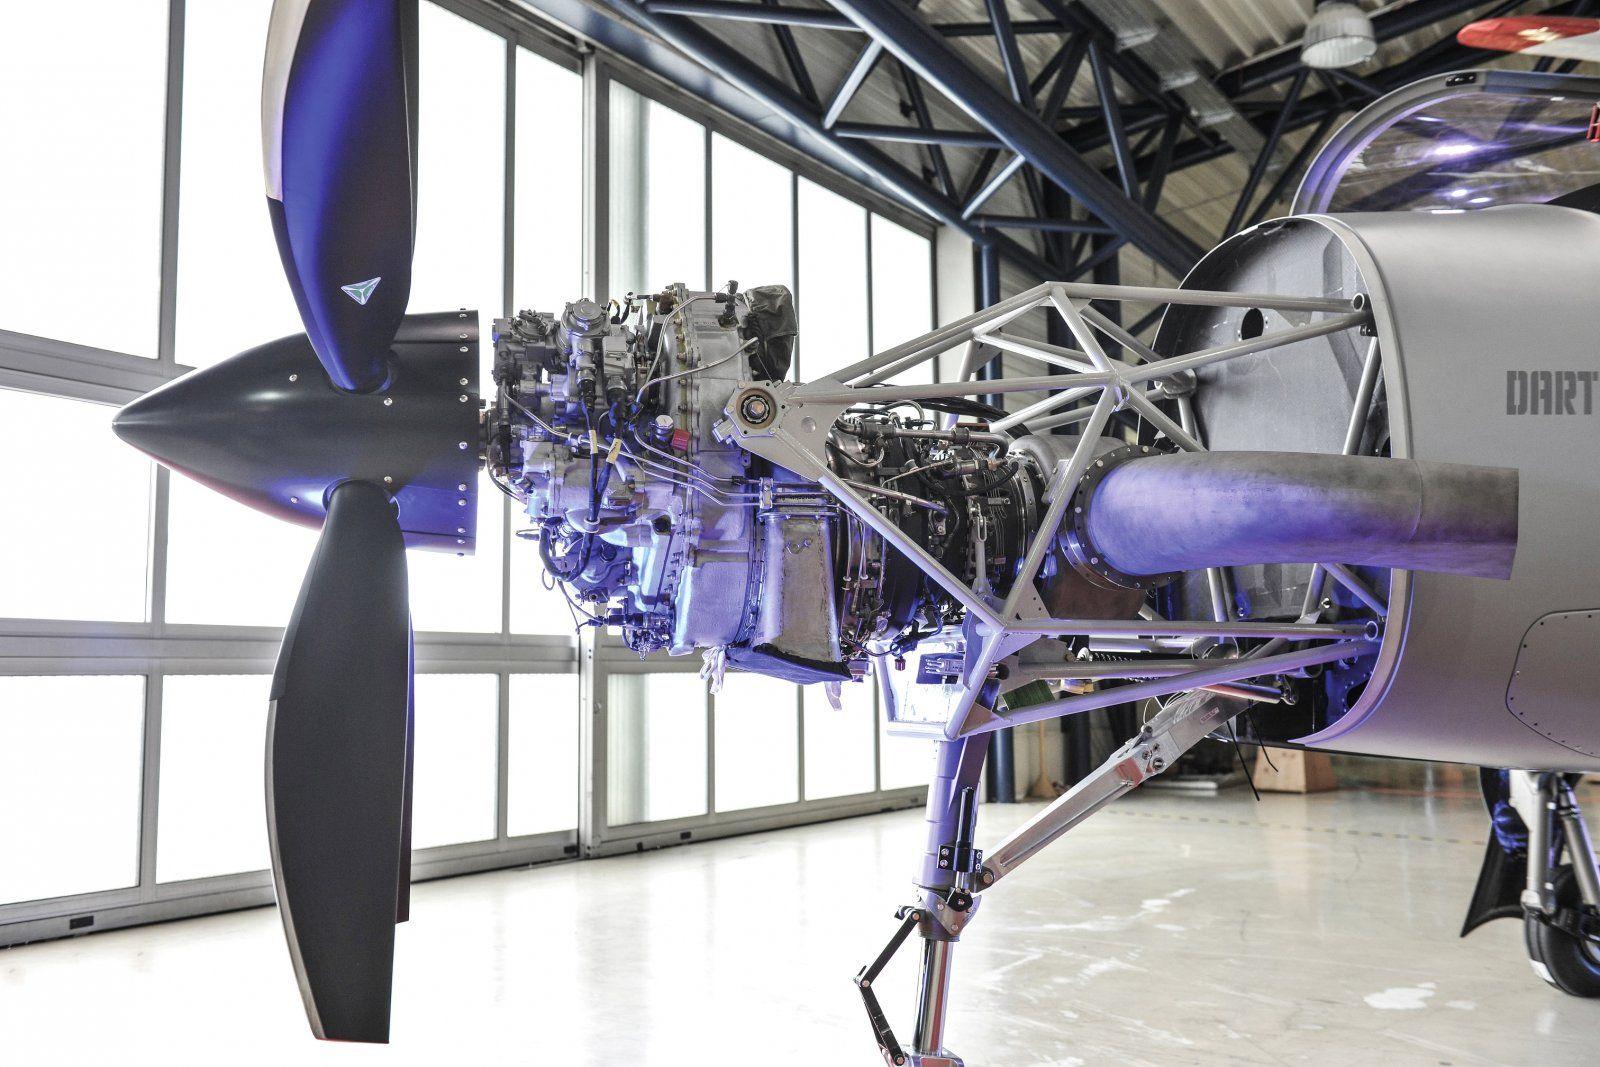 DART_Highlight_1_Propulsion_Bild_1_DART-450_Turboprop_engine_AI-450_SR.jpg